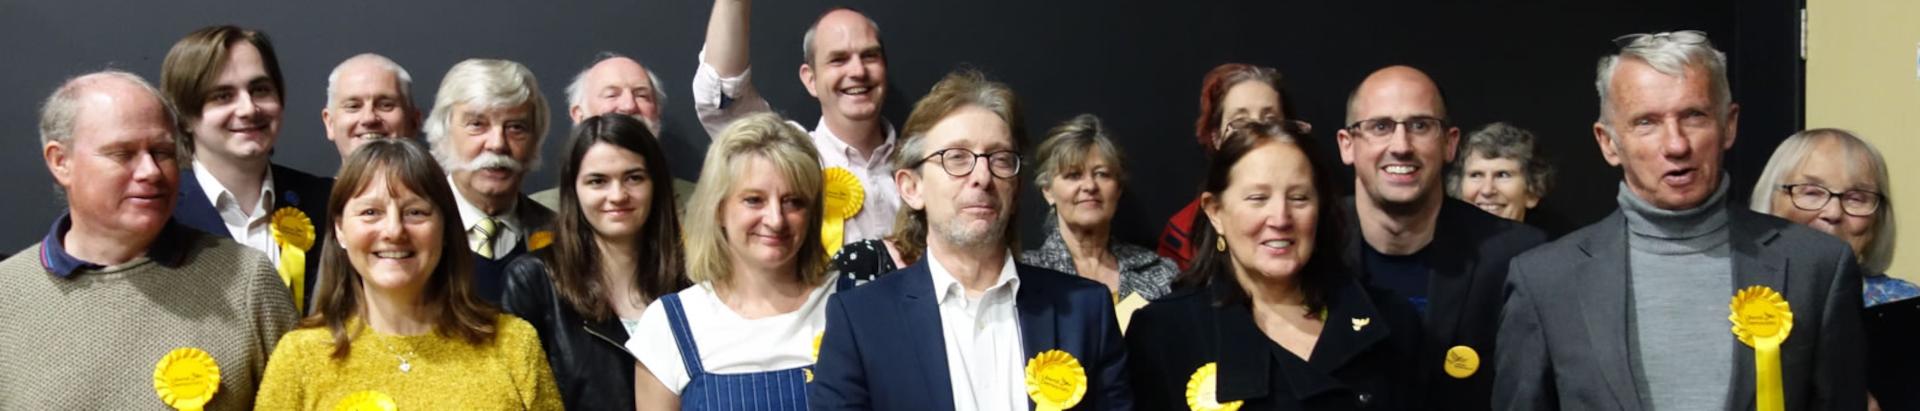 Broadland Councillors